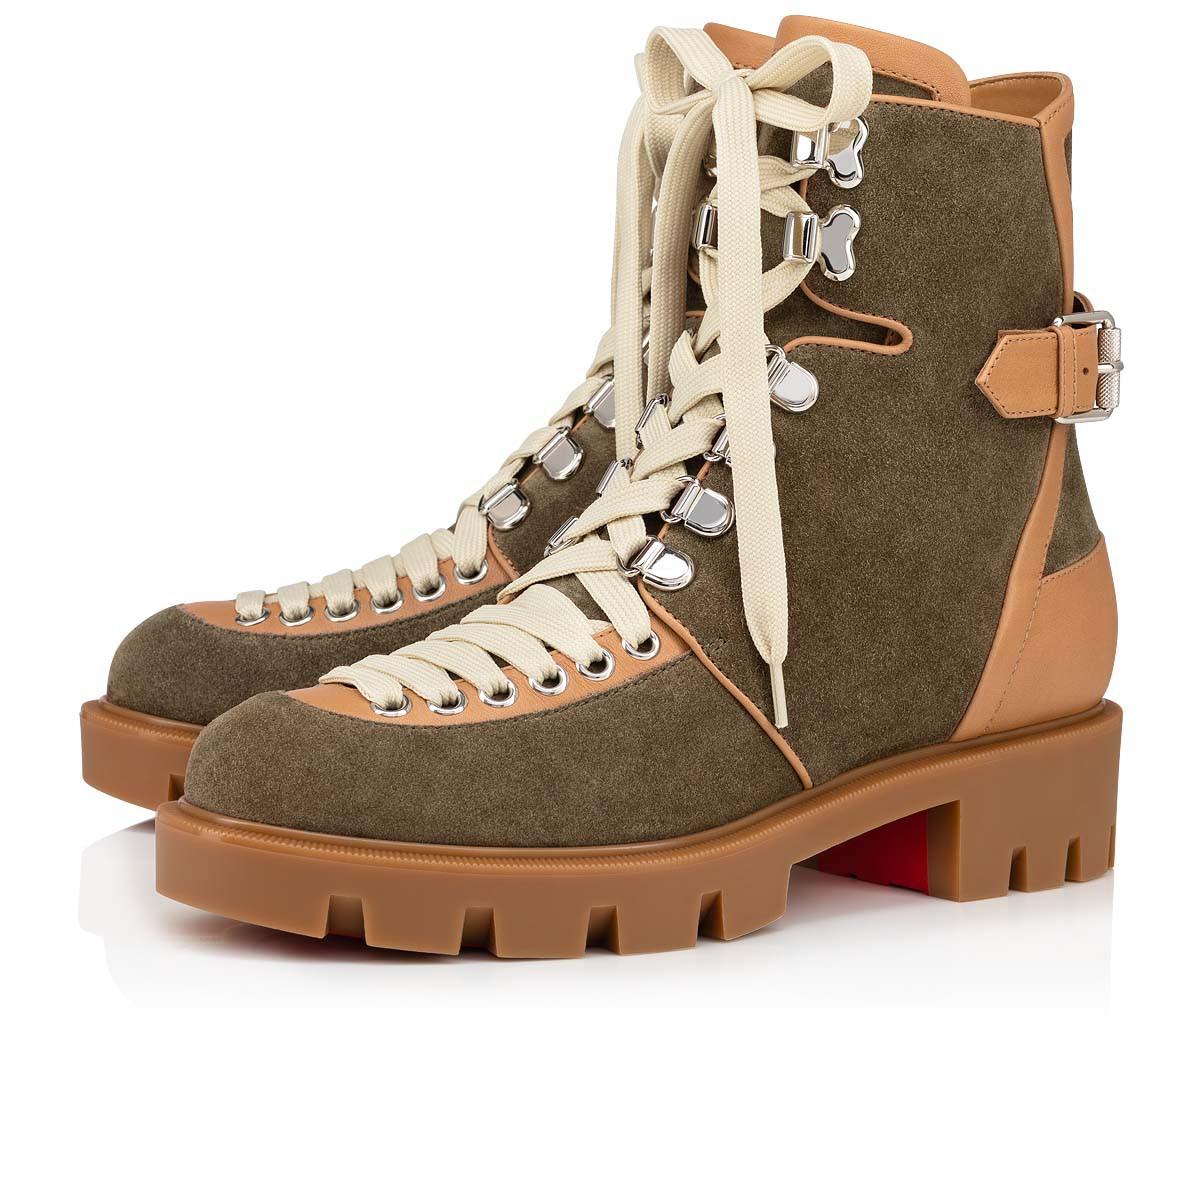 Shoes - Macademia Flat - Christian Louboutin